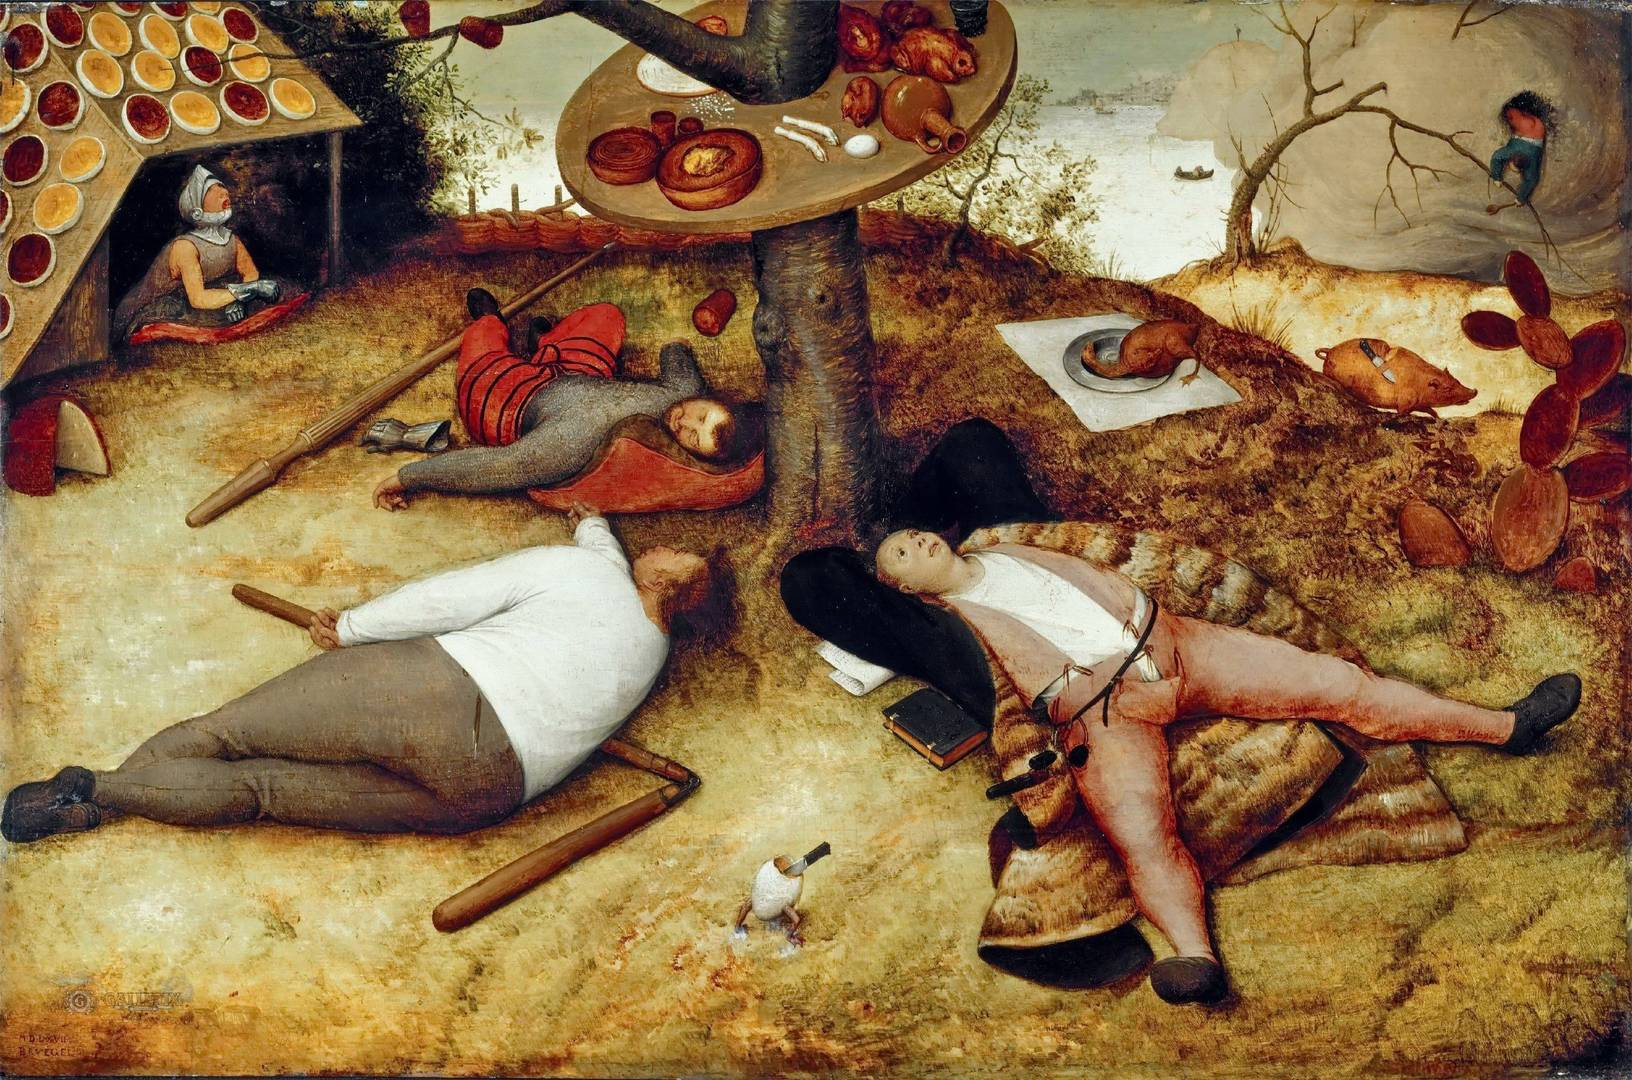 Питер Брейгель. Страна лентяев. 1567.